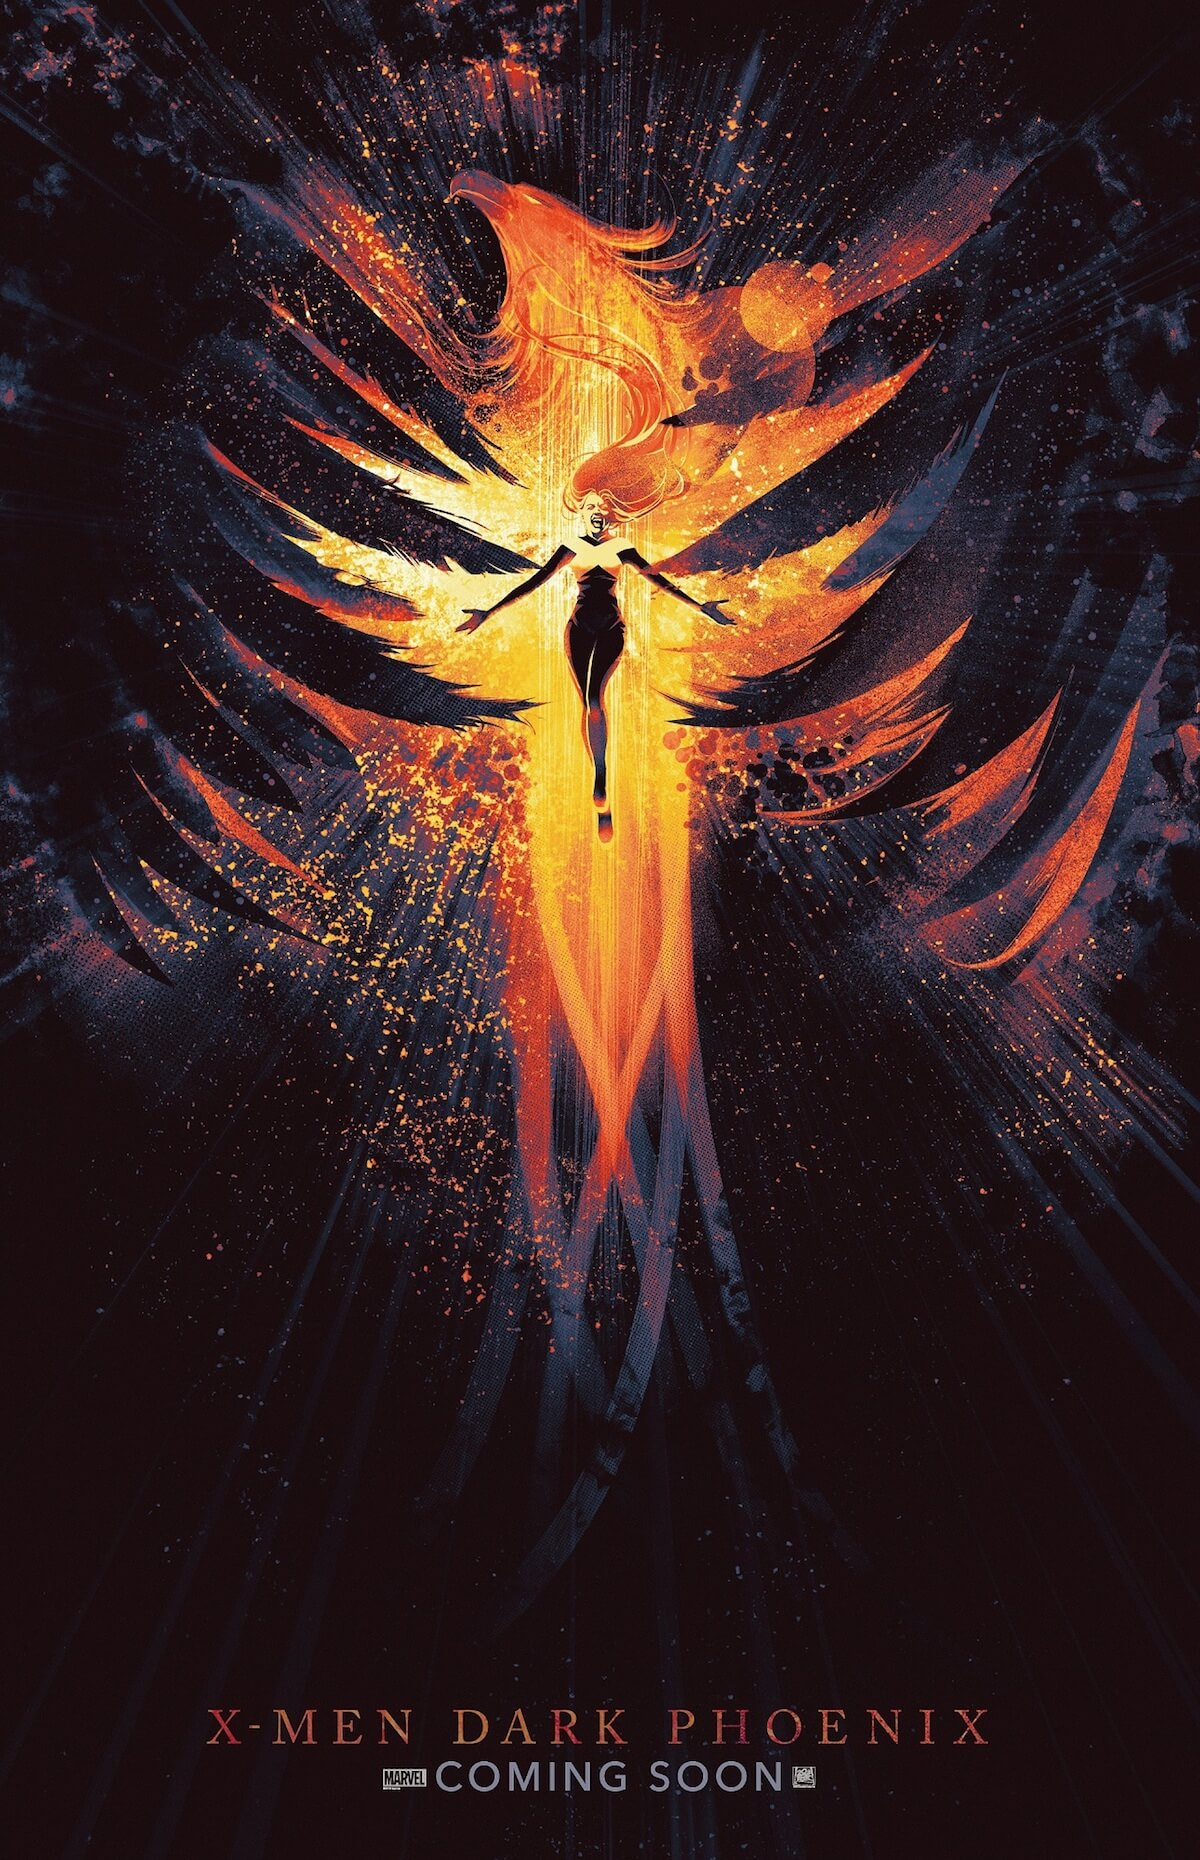 『X-MEN:ダーク・フェニックス』公開記念イベント<XーMEN DAY>が開催!ジーン役ソフィー・ターナーの特別映像解禁 film190517_xmenday_2